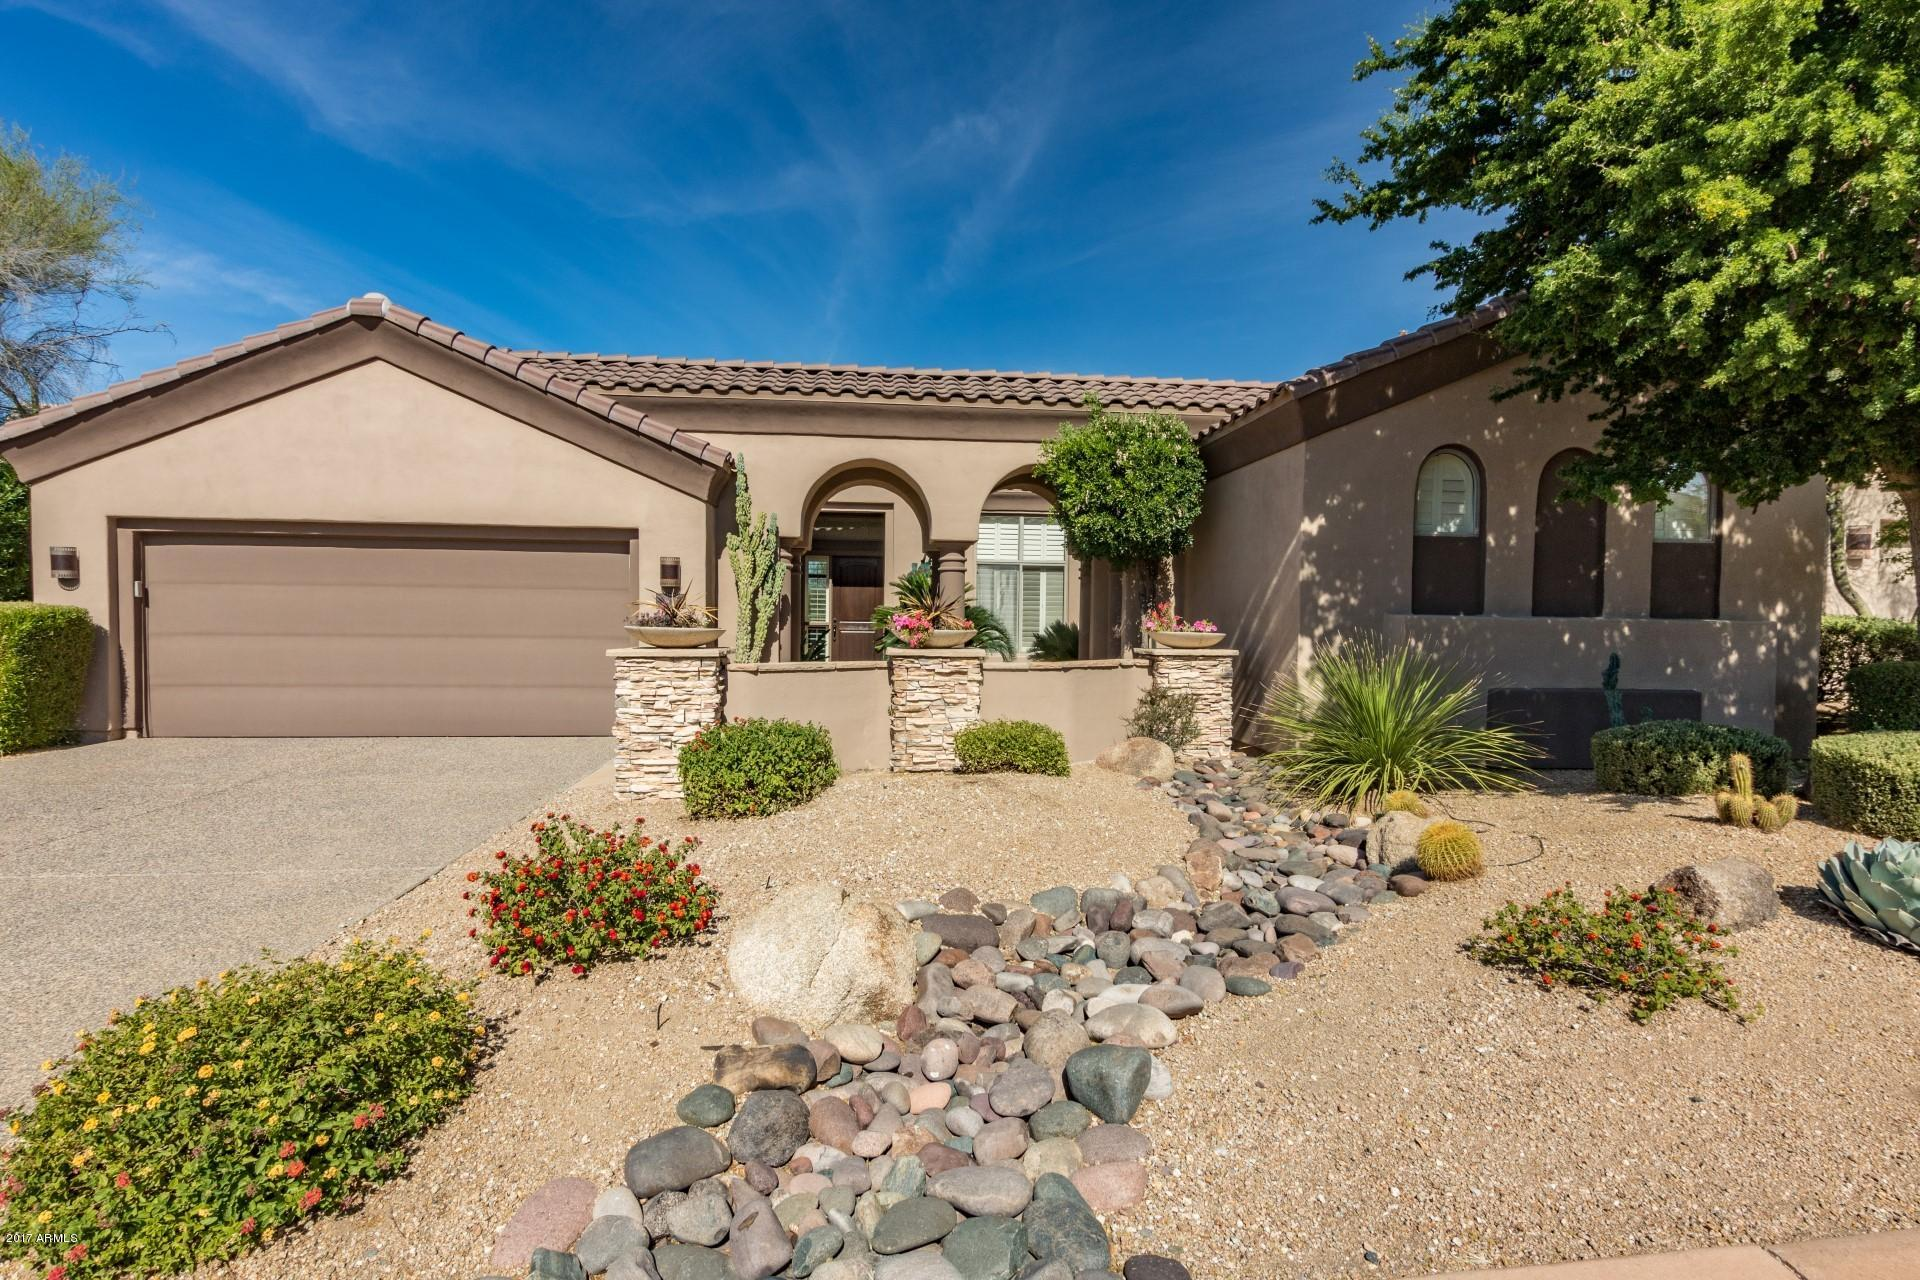 9426 E Cavalry Drive, Scottsdale AZ 85262 - Photo 2